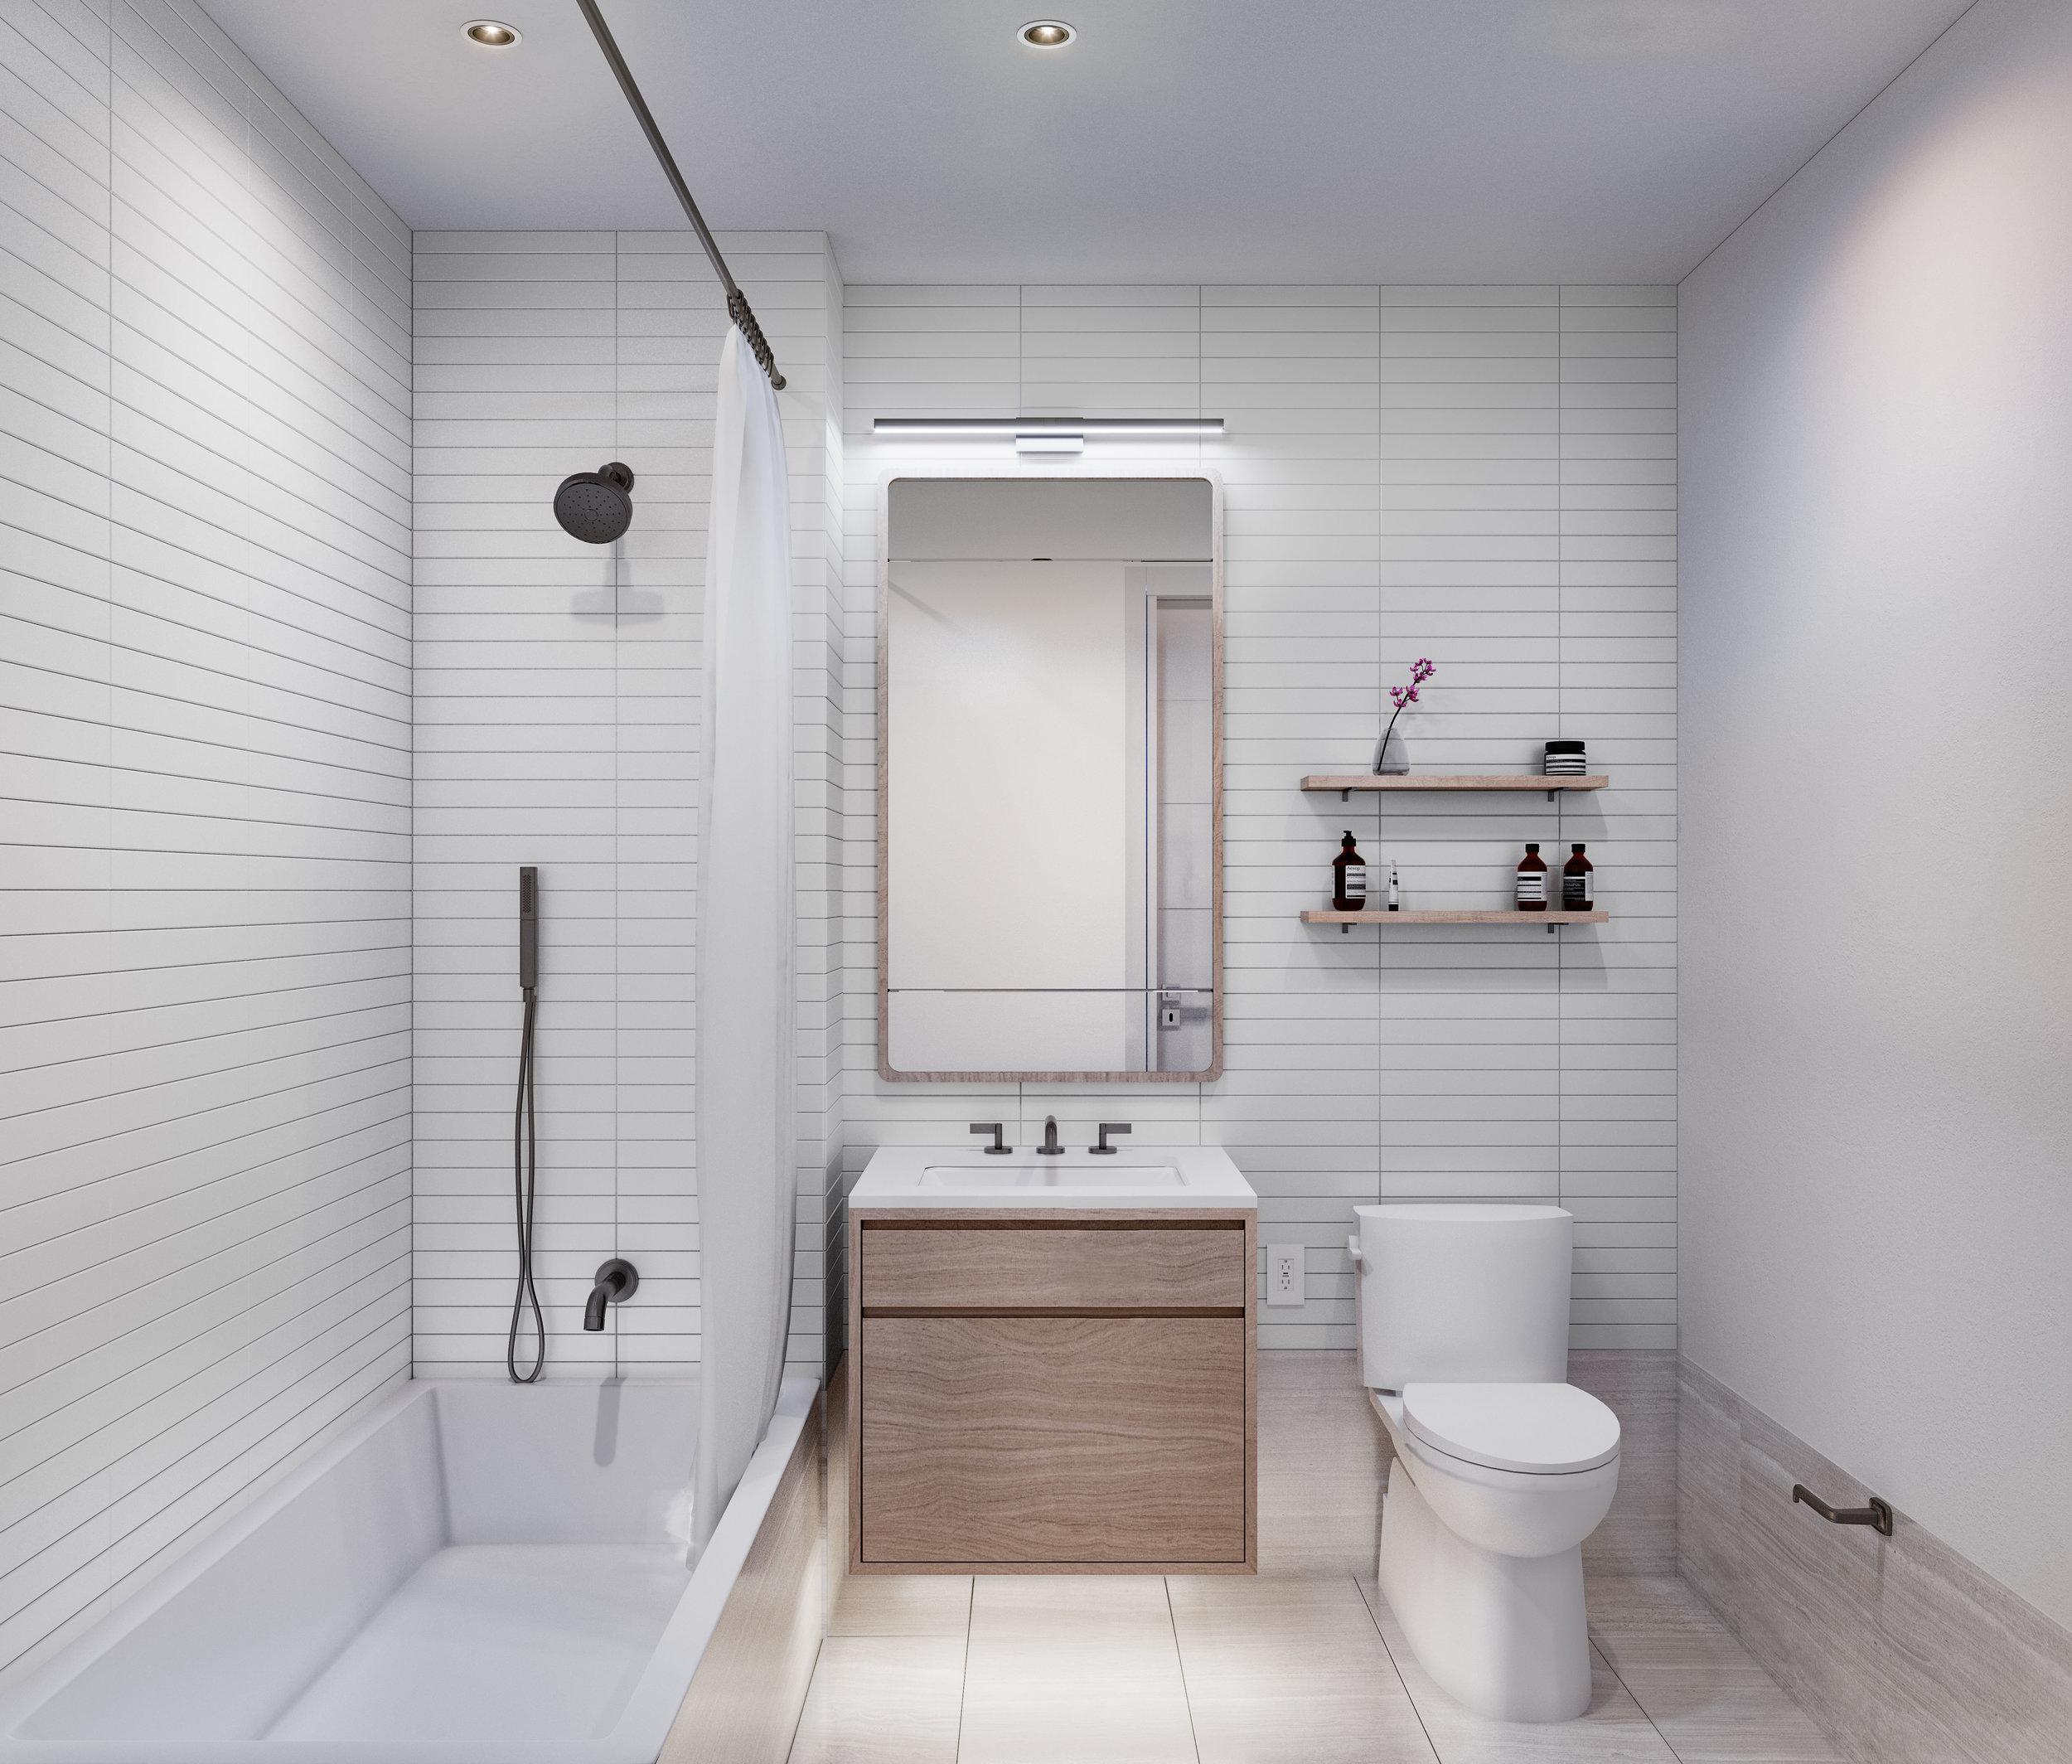 5CO_Bathroom 01.jpg